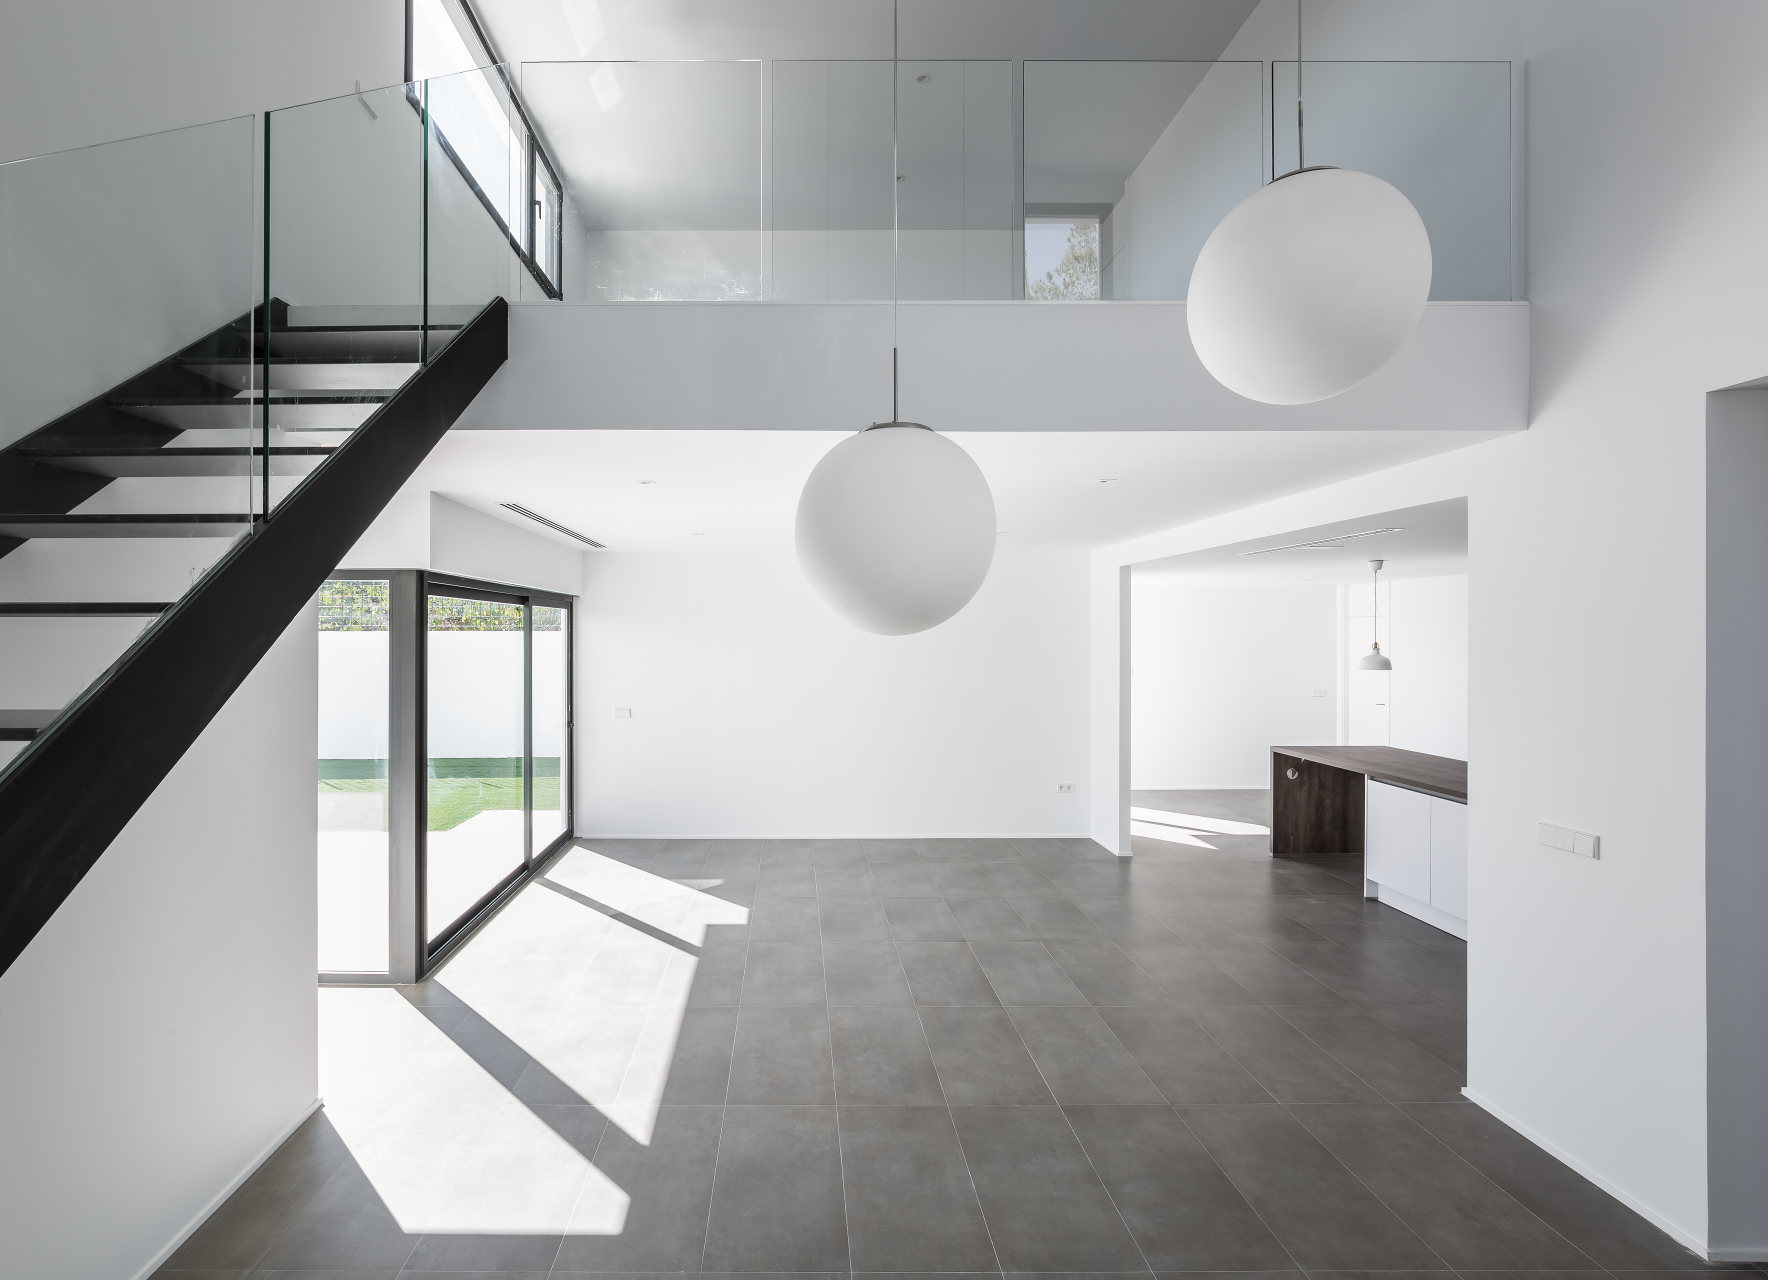 fotografia-arquitectura-valencia-german-cabo-viraje-el-vedat-torrent (22)